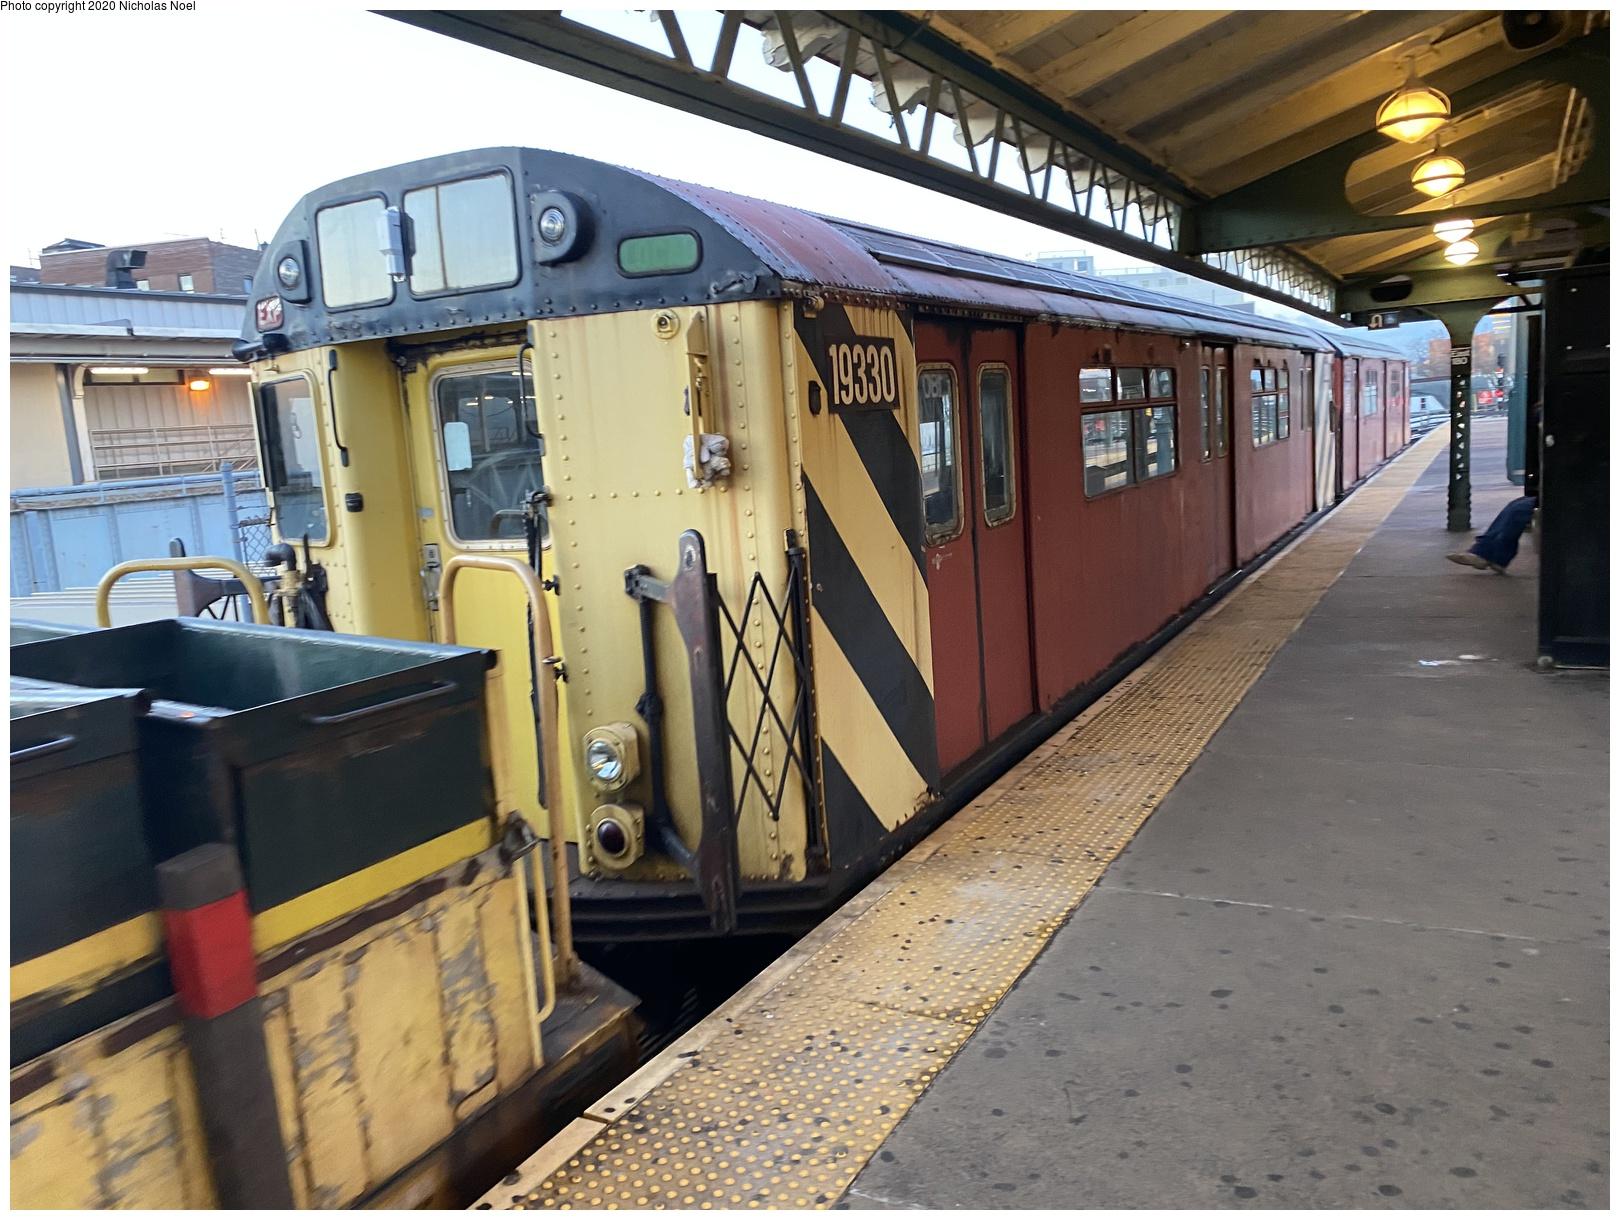 (669k, 1620x1220)<br><b>Country:</b> United States<br><b>City:</b> New York<br><b>System:</b> New York City Transit<br><b>Line:</b> IRT White Plains Road Line<br><b>Location:</b> East 180th Street<br><b>Route:</b> Work Service<br><b>Car:</b> R-33 World's Fair (St. Louis, 1963-64) 9330 <br><b>Photo by:</b> Nicholas Noel<br><b>Date:</b> 2/14/2020<br><b>Viewed (this week/total):</b> 3 / 219